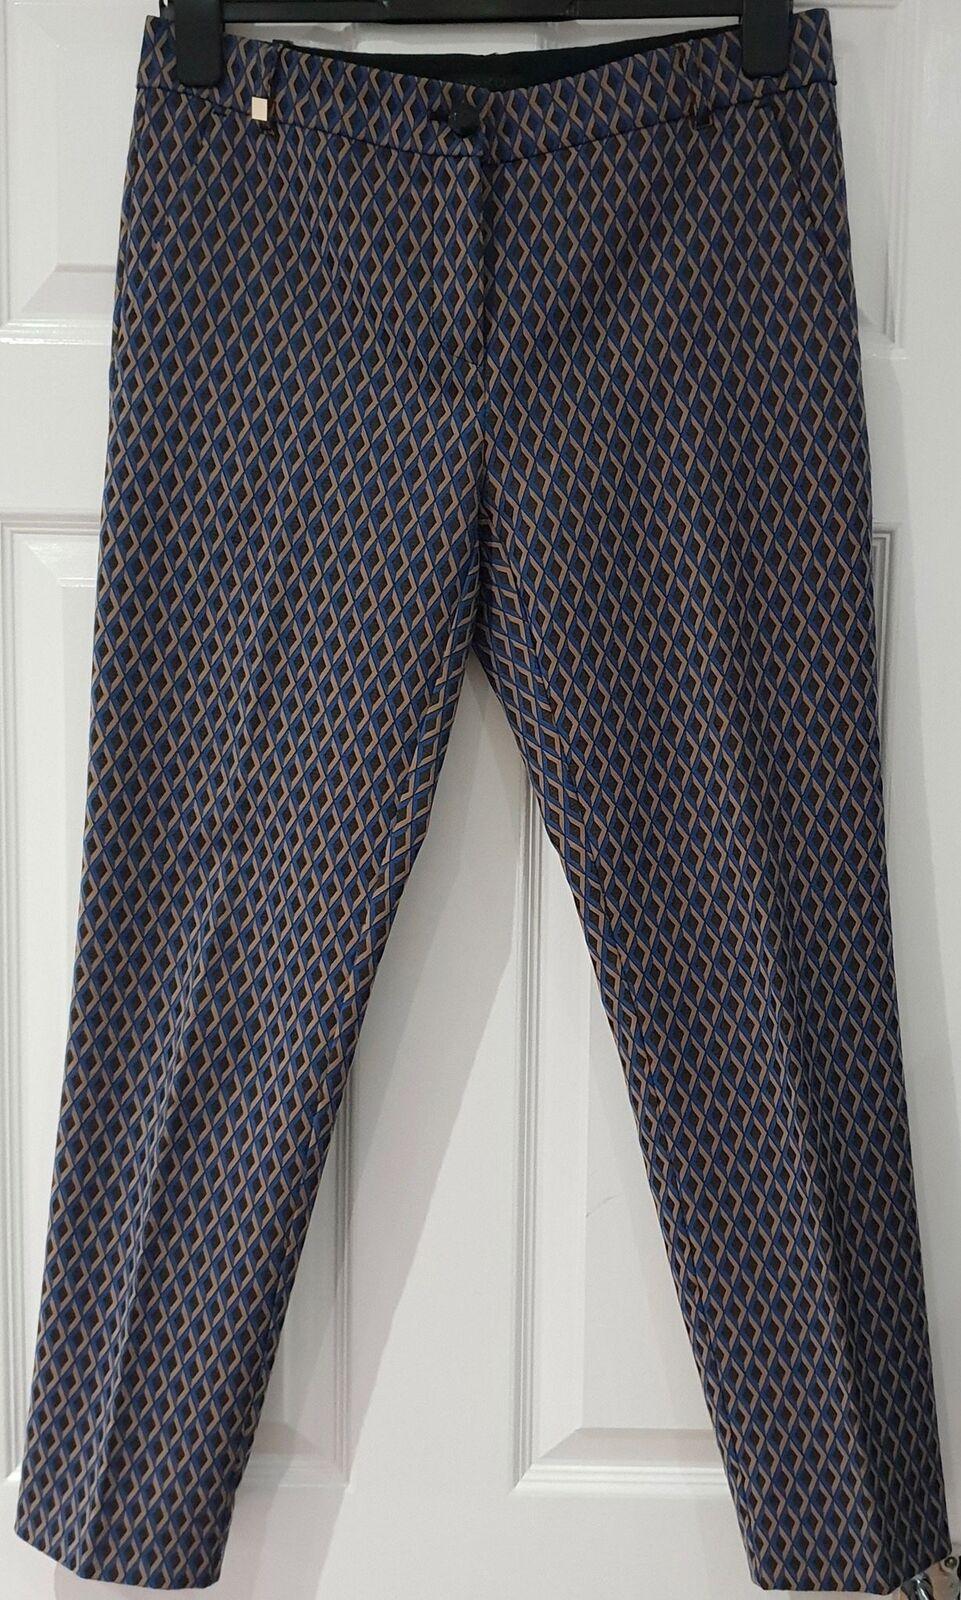 rosaO blu Beige nero Diamond Pattern Tapered Crop Capri Trousers Pants 44 UK12